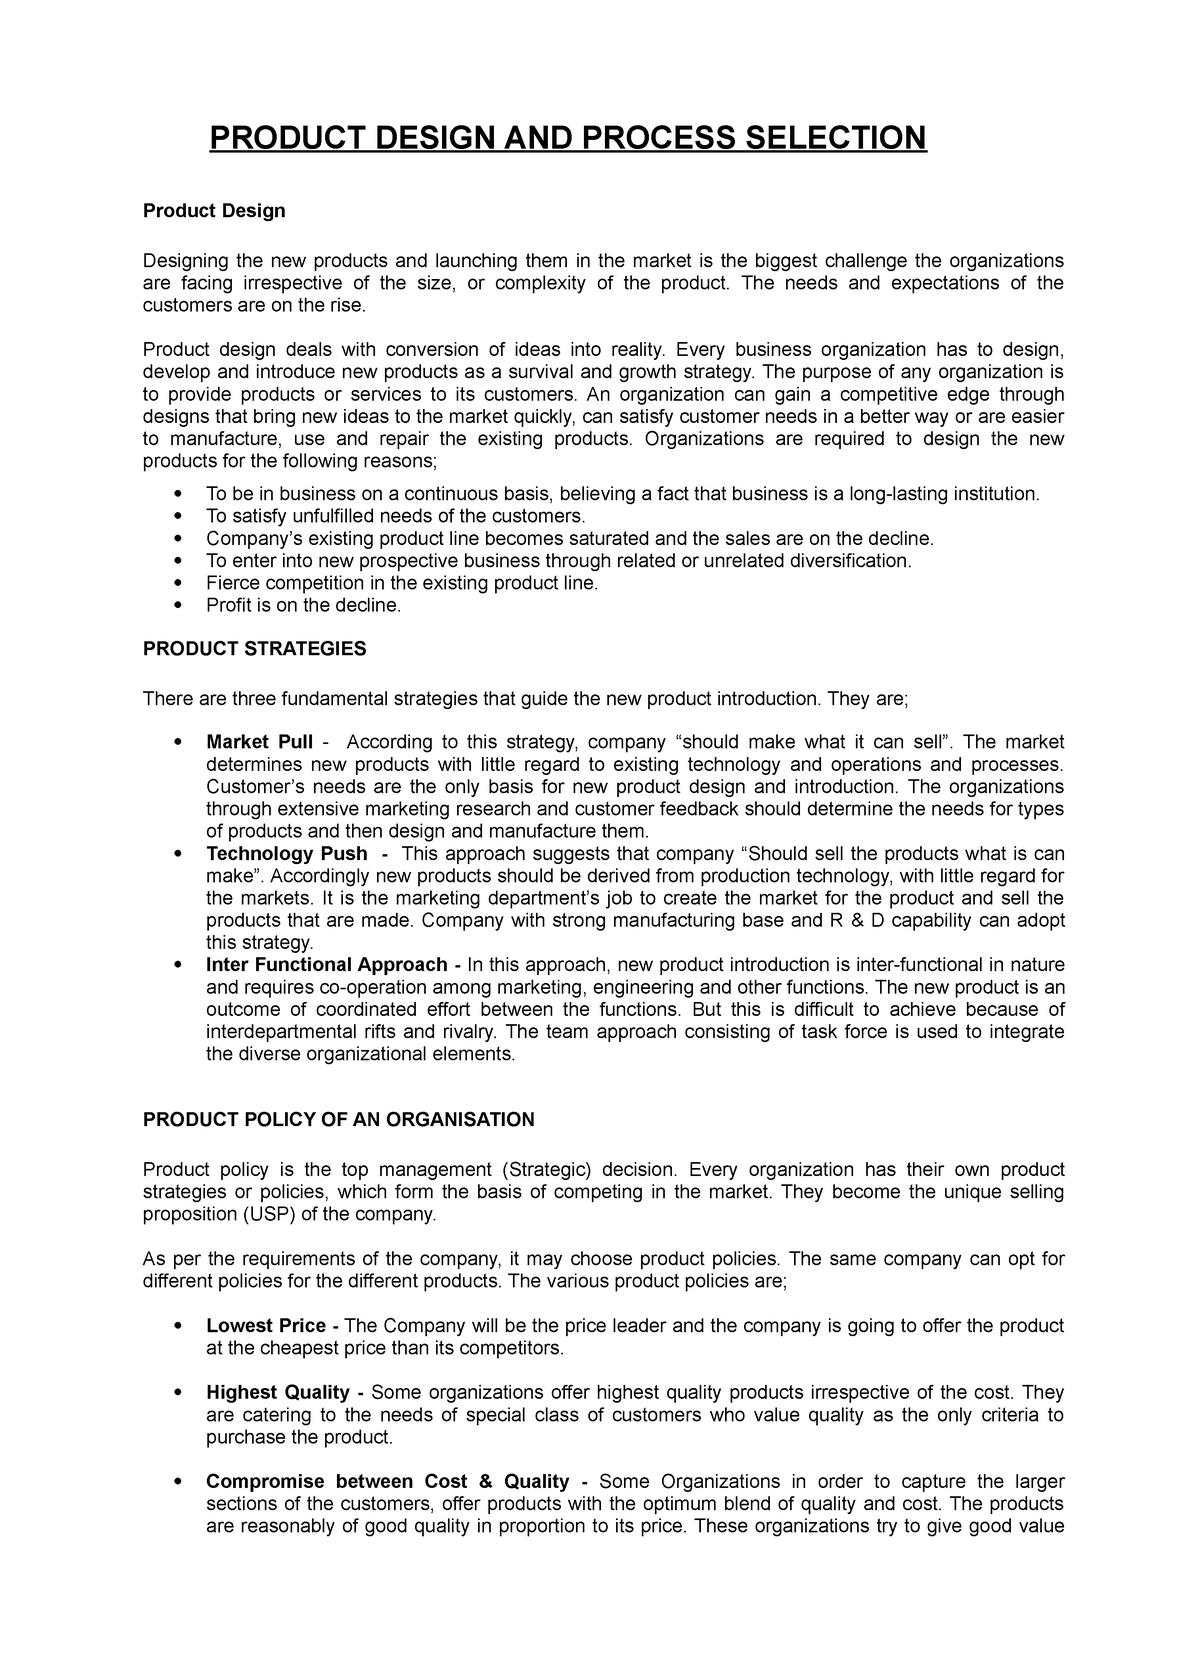 Product Design And Process Analysis Operation Management Studocu